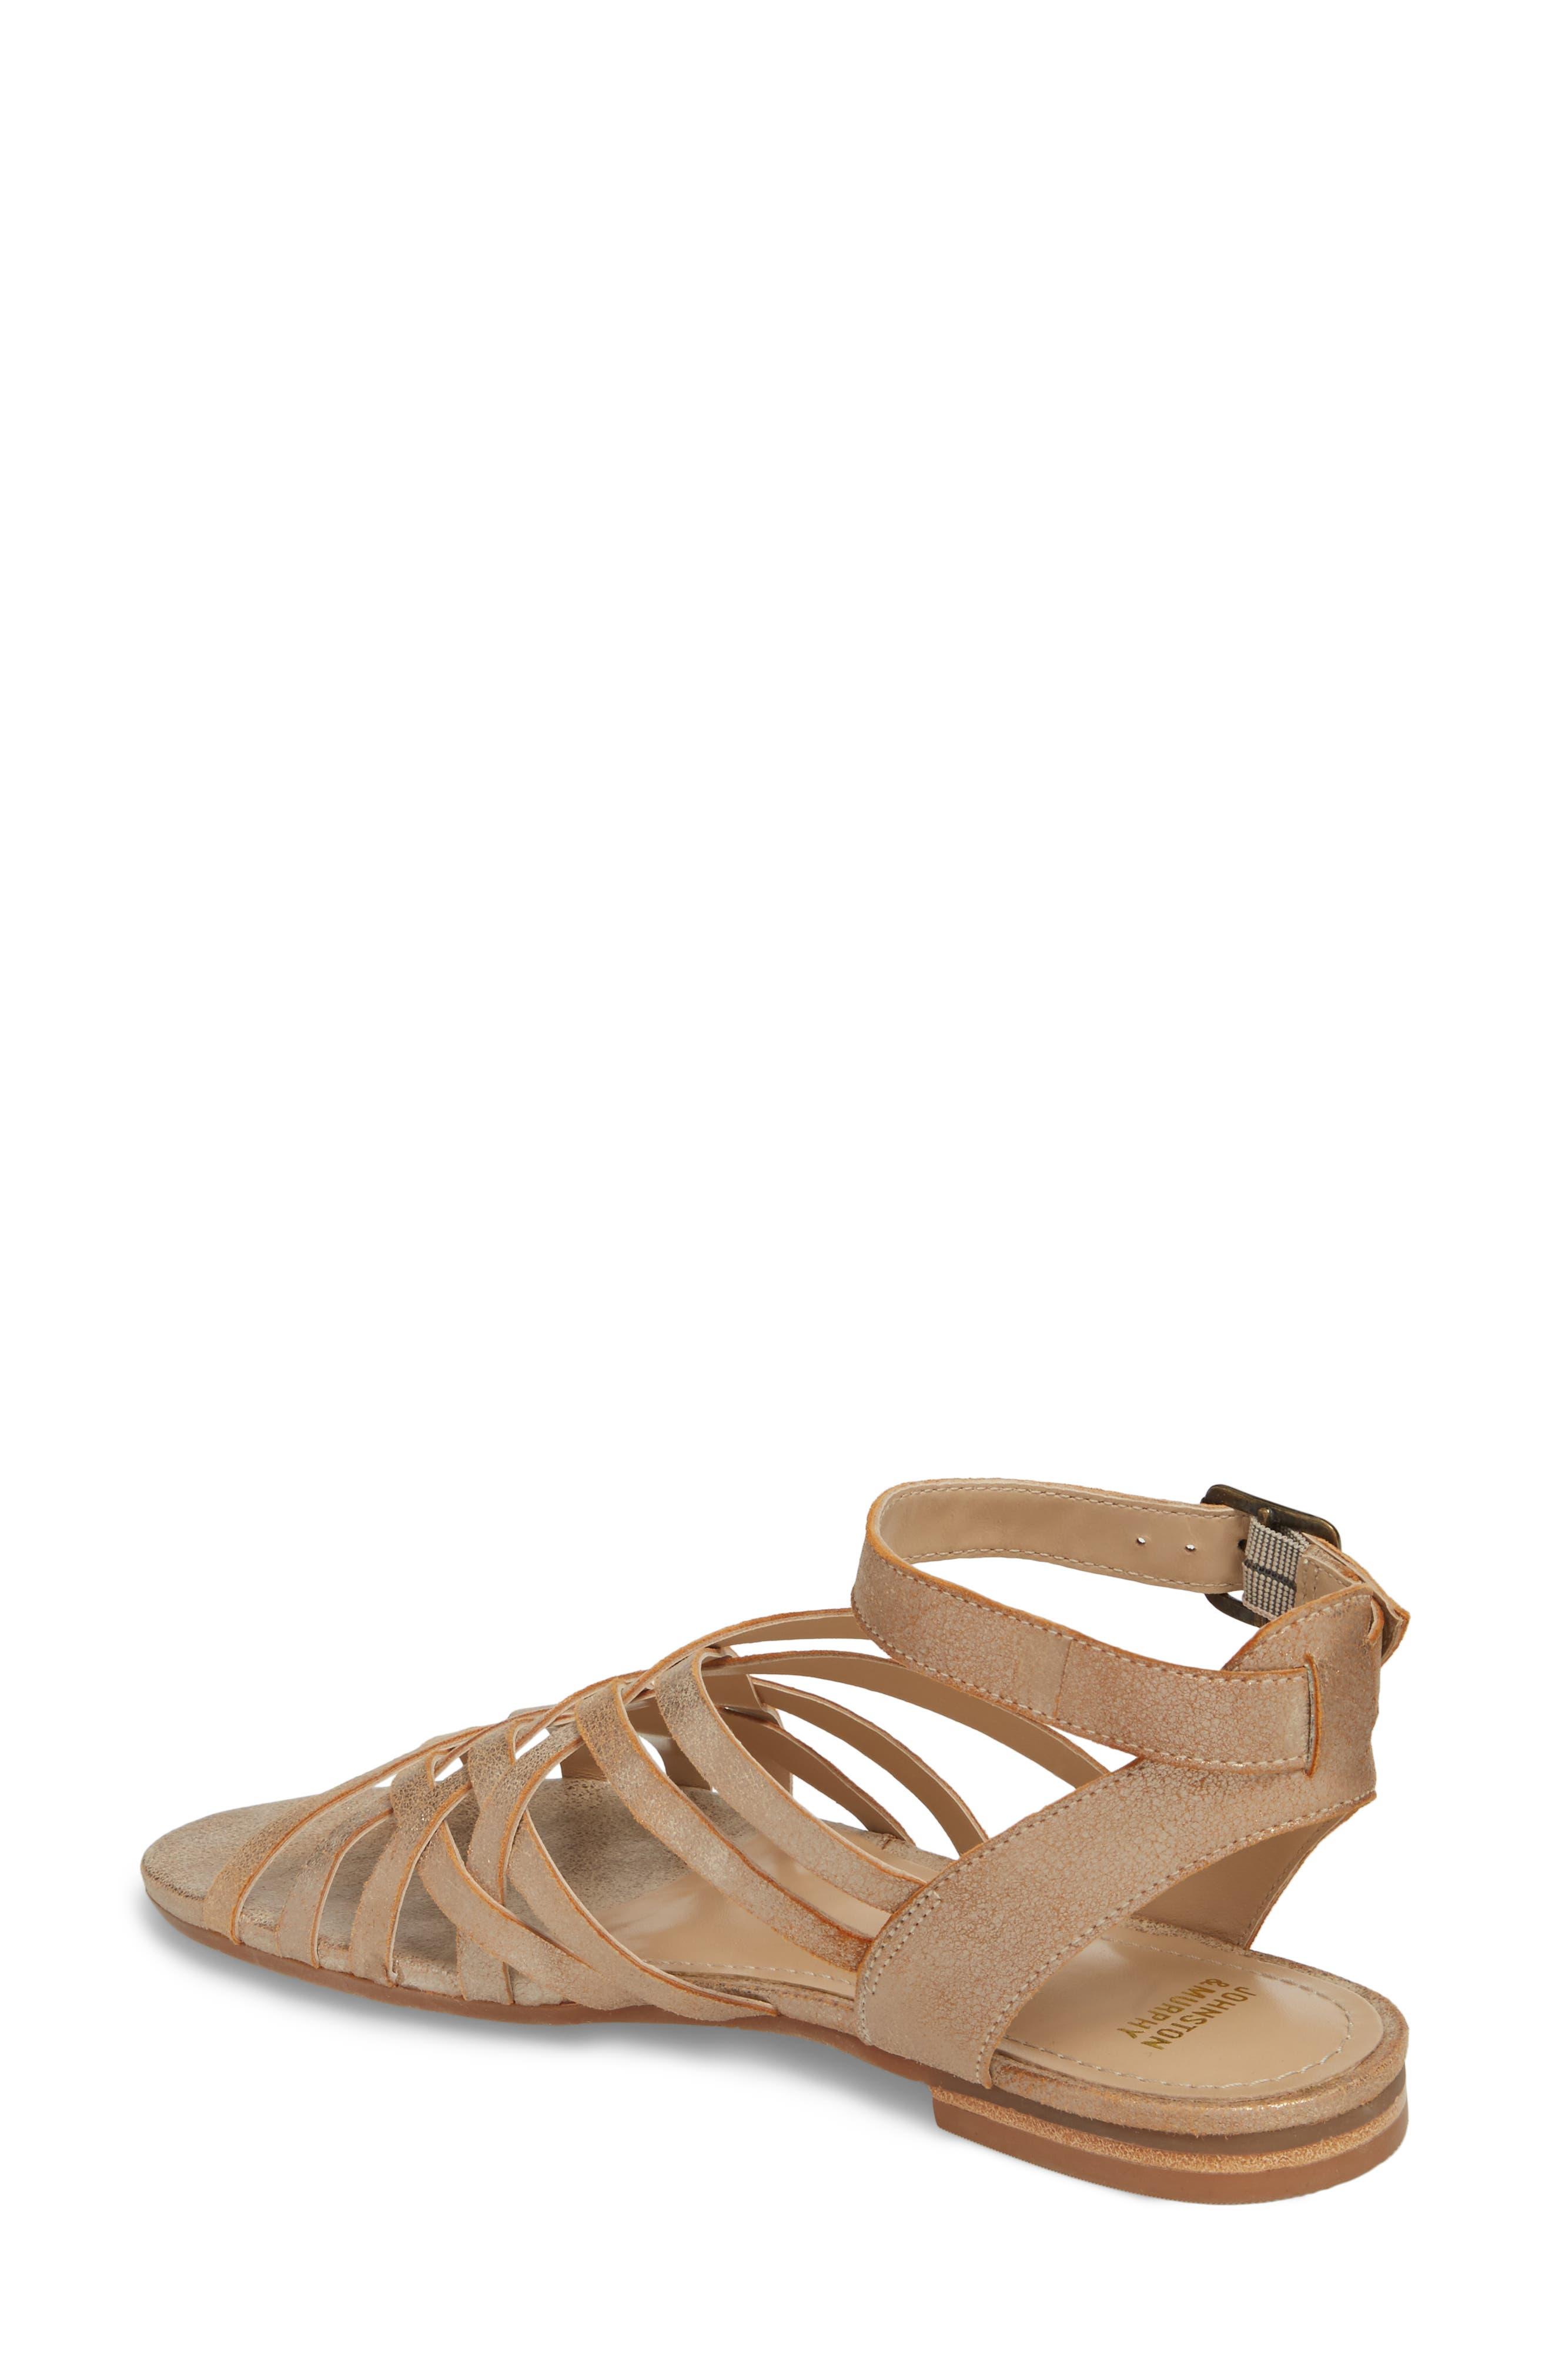 Hallie Sandal,                             Alternate thumbnail 2, color,                             Copper Leather